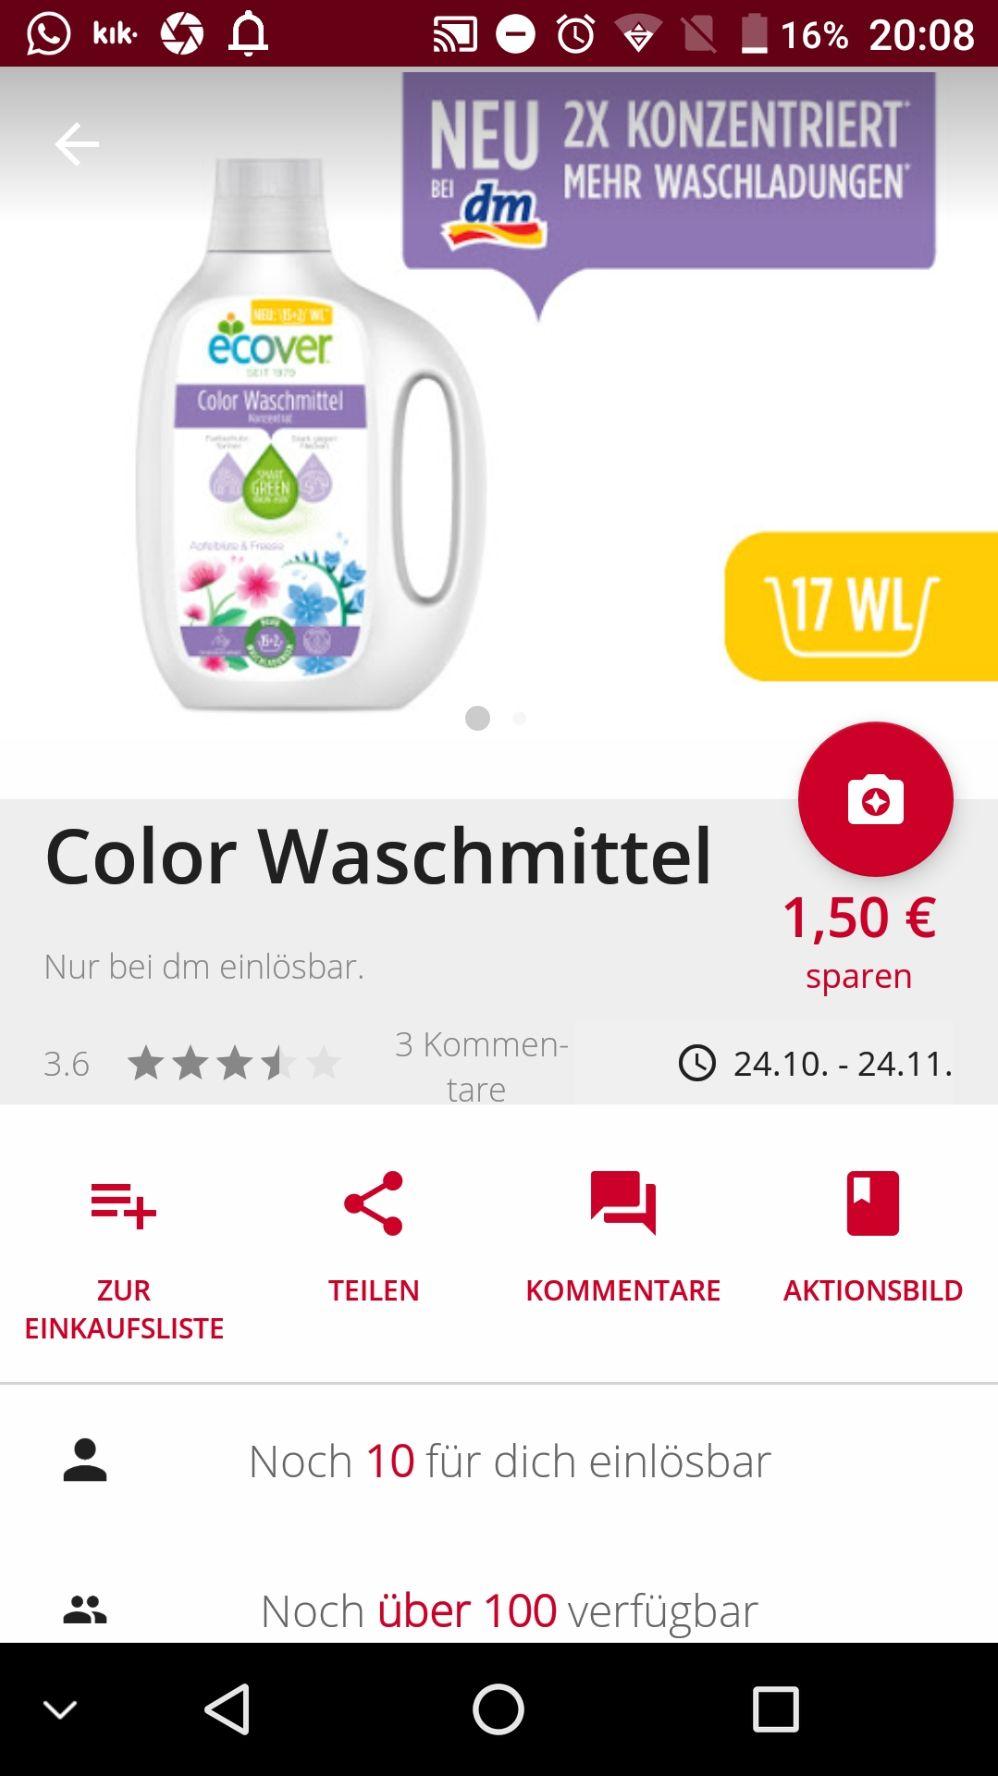 (Scondoo)Ecover Waschmittel 1,50€ Cashback (dm only)